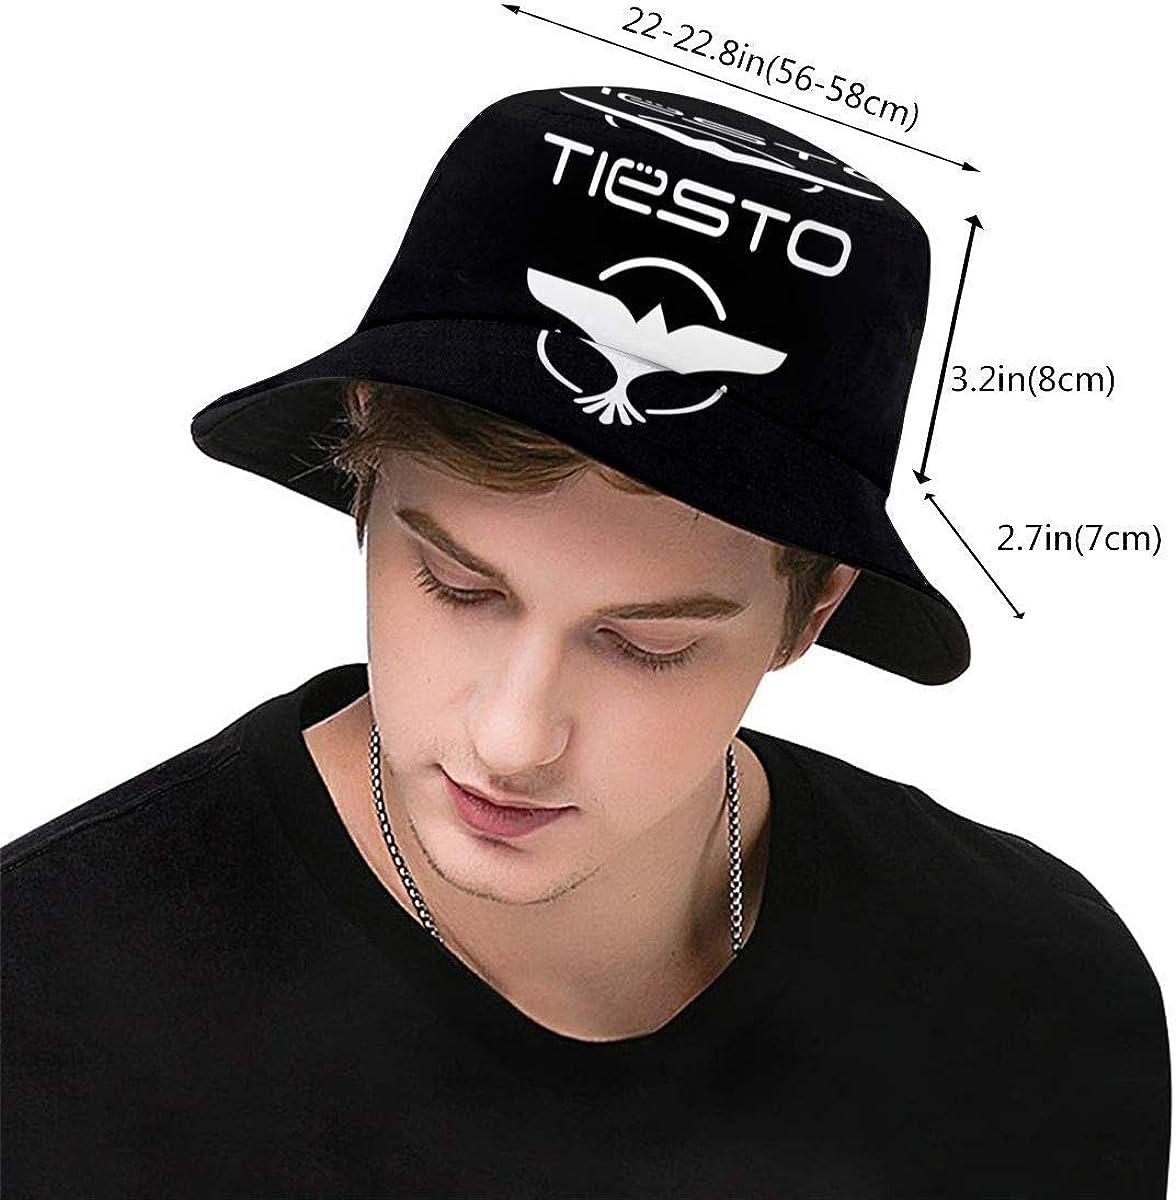 XBYC Fashion Tiesto Print Bucket Hat Summer Reversible Packable Cap Fisherman Cap for Men Women